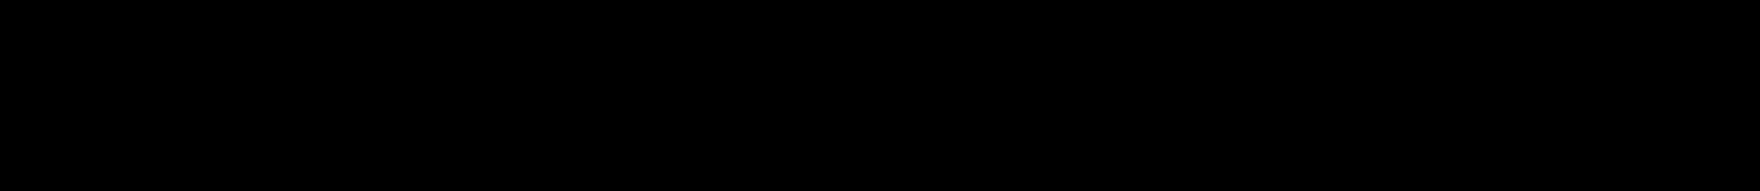 YWFT 6x7oct Black